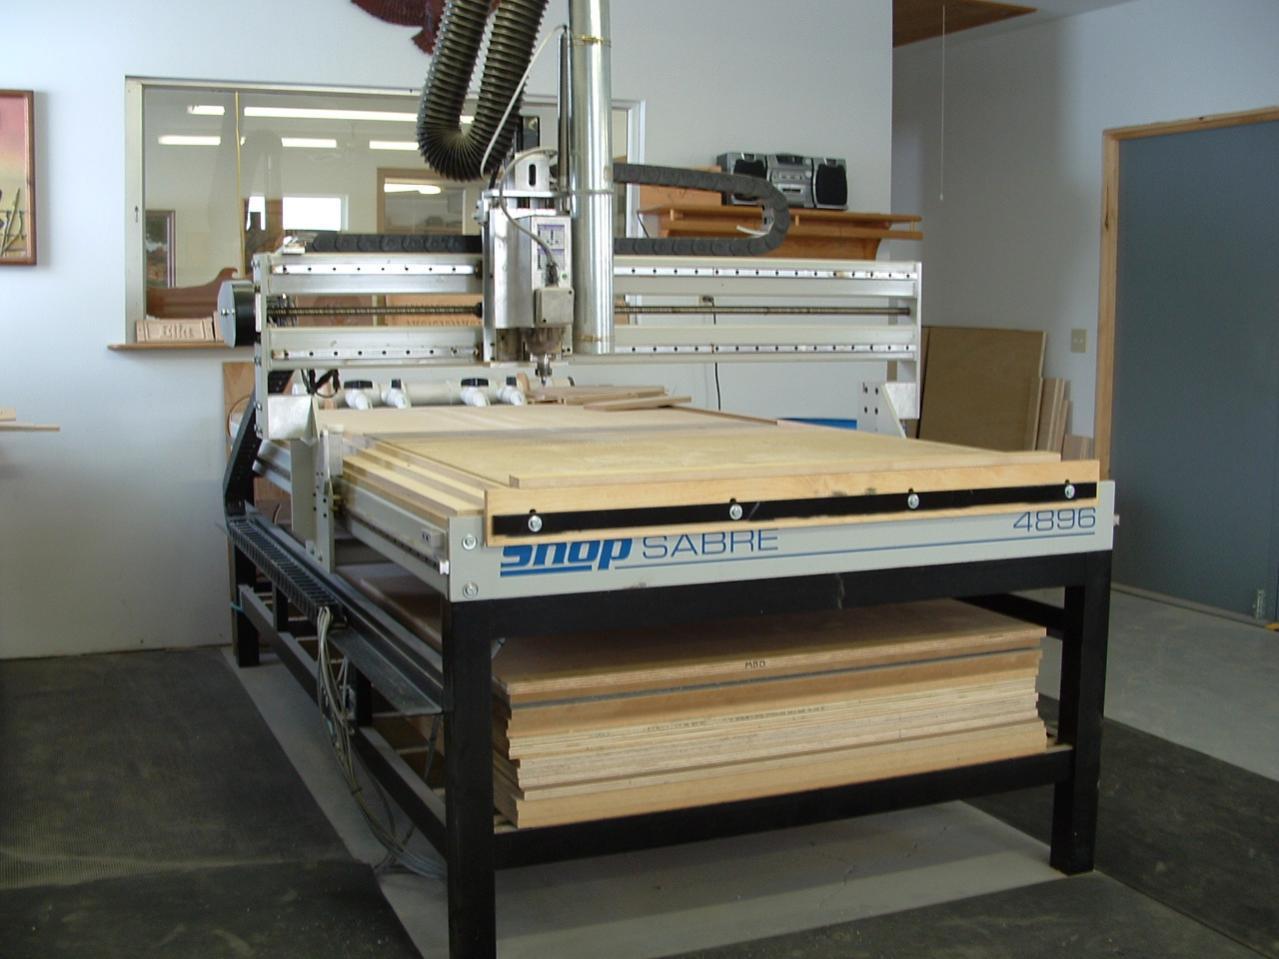 CNC vs. Panel Saw for one man shop-dscf0159.jpg